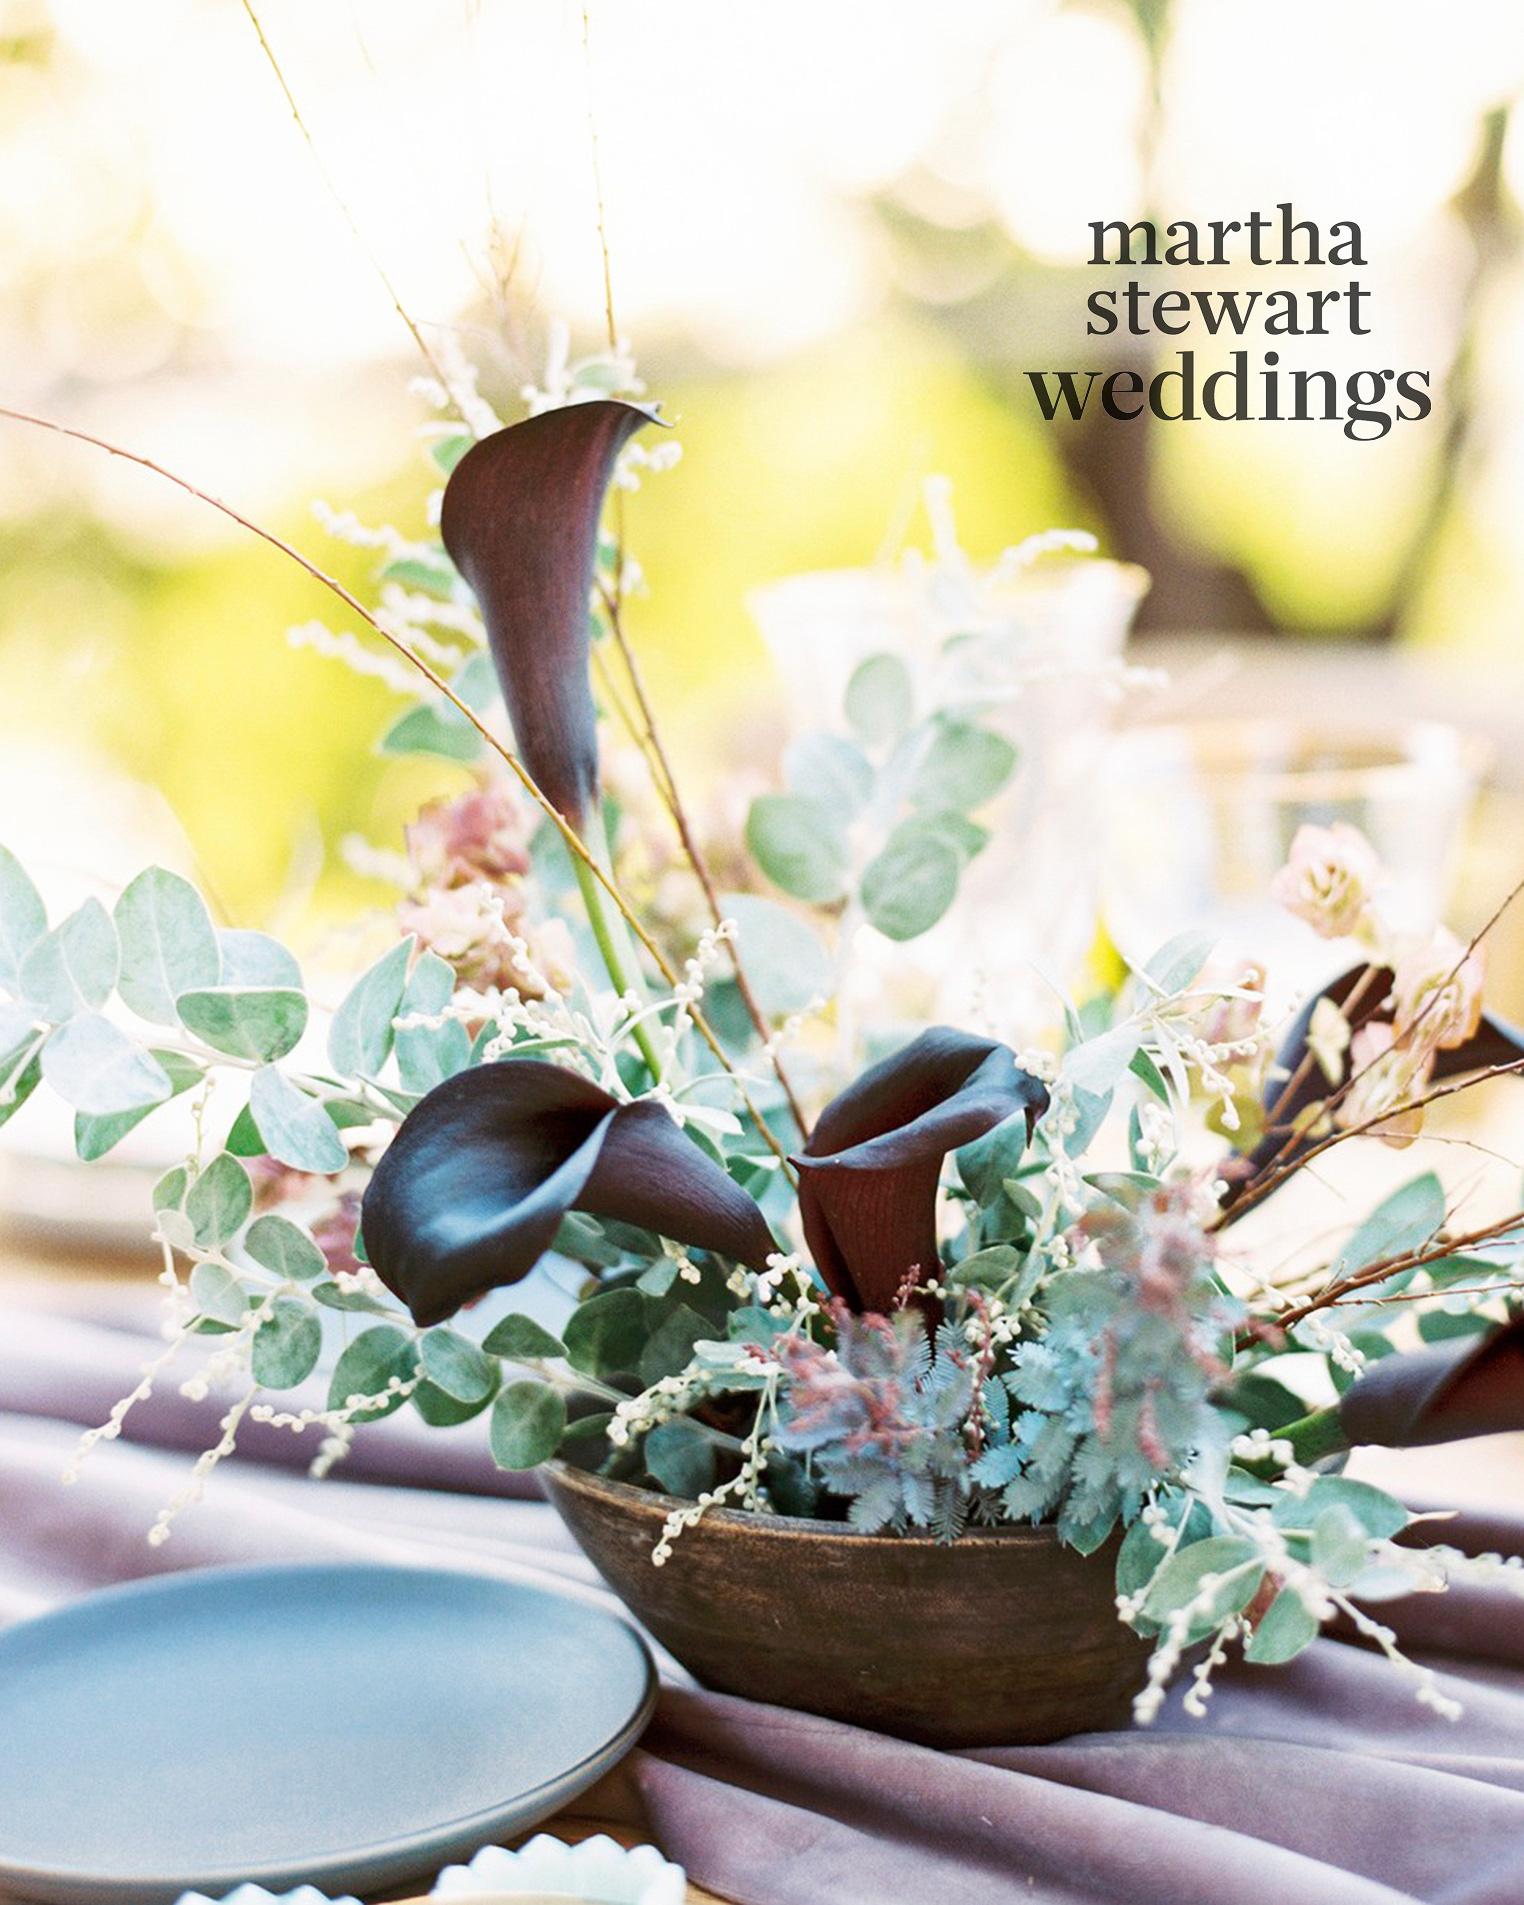 Celebrity Wedding Flowers Centerpieces: 40 Of Our Favorite Floral Wedding Centerpieces